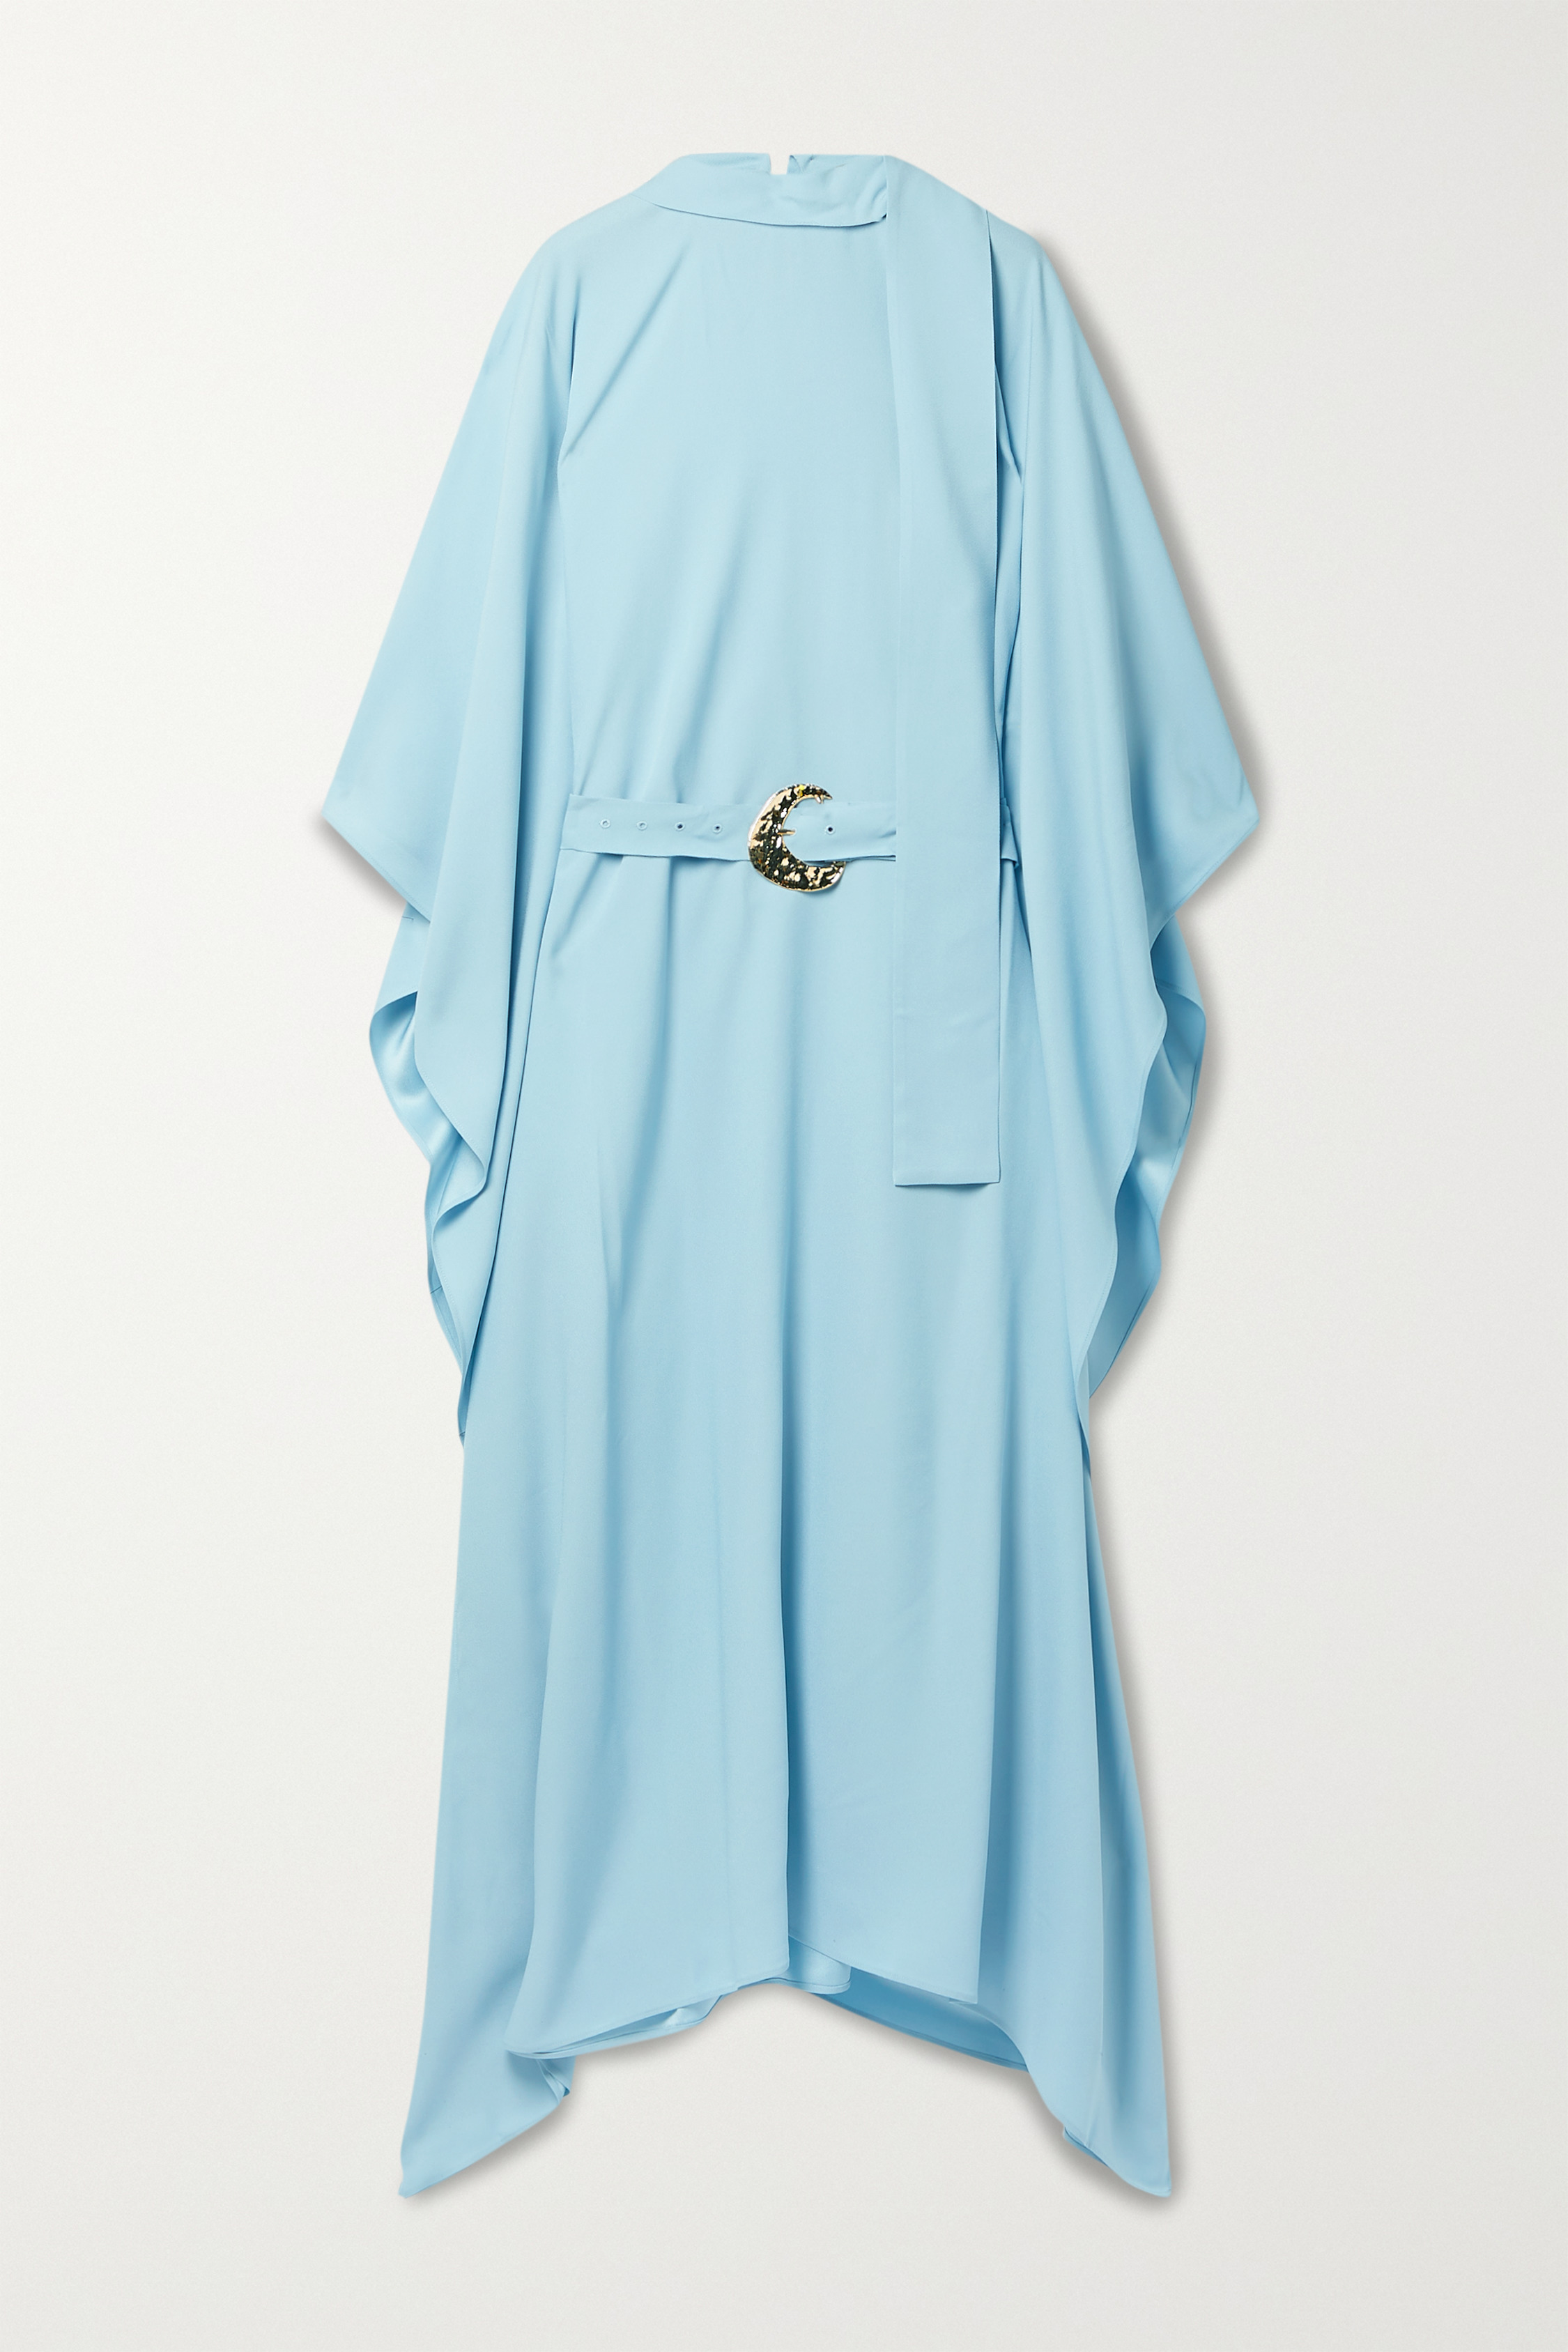 Net-a-Porter celebrates modest fashion ahead of Ramadan (фото 11)